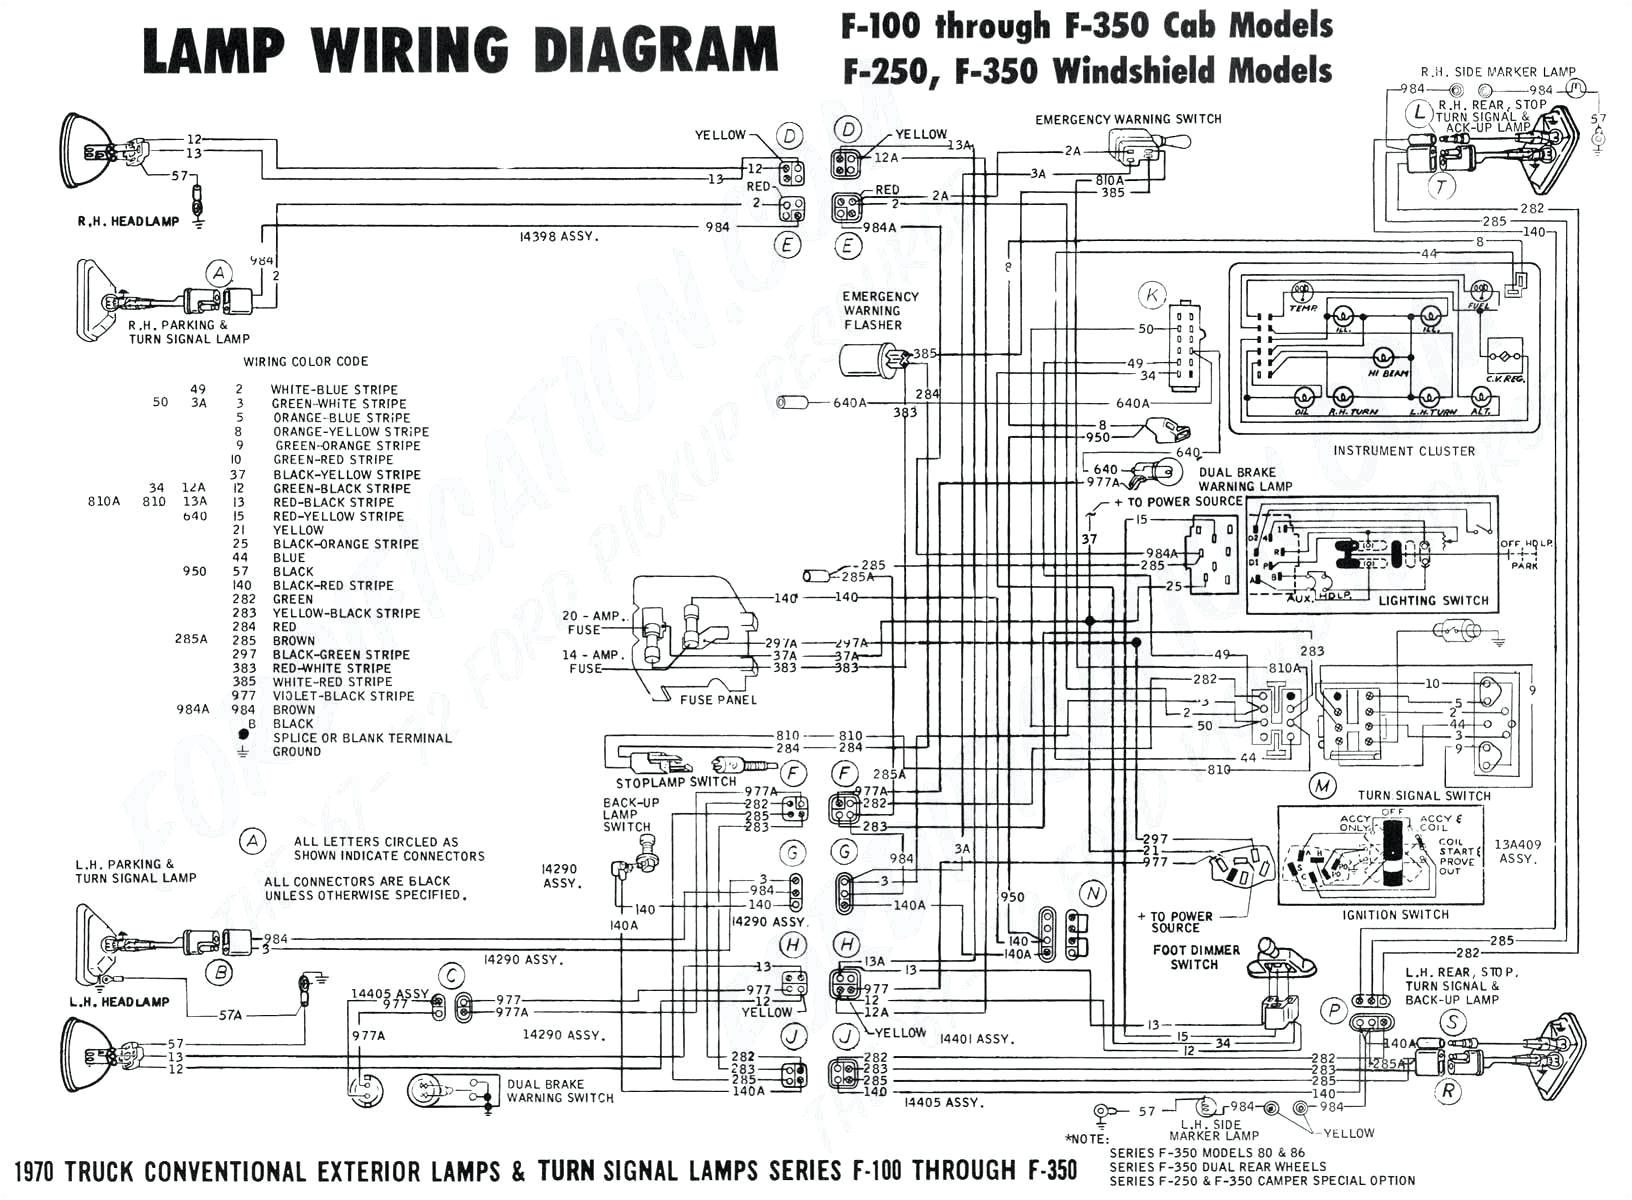 94 jeep cherokee radio wiring diagram lovely 94 jeep grand cherokee stereo wiring diagram best 2000